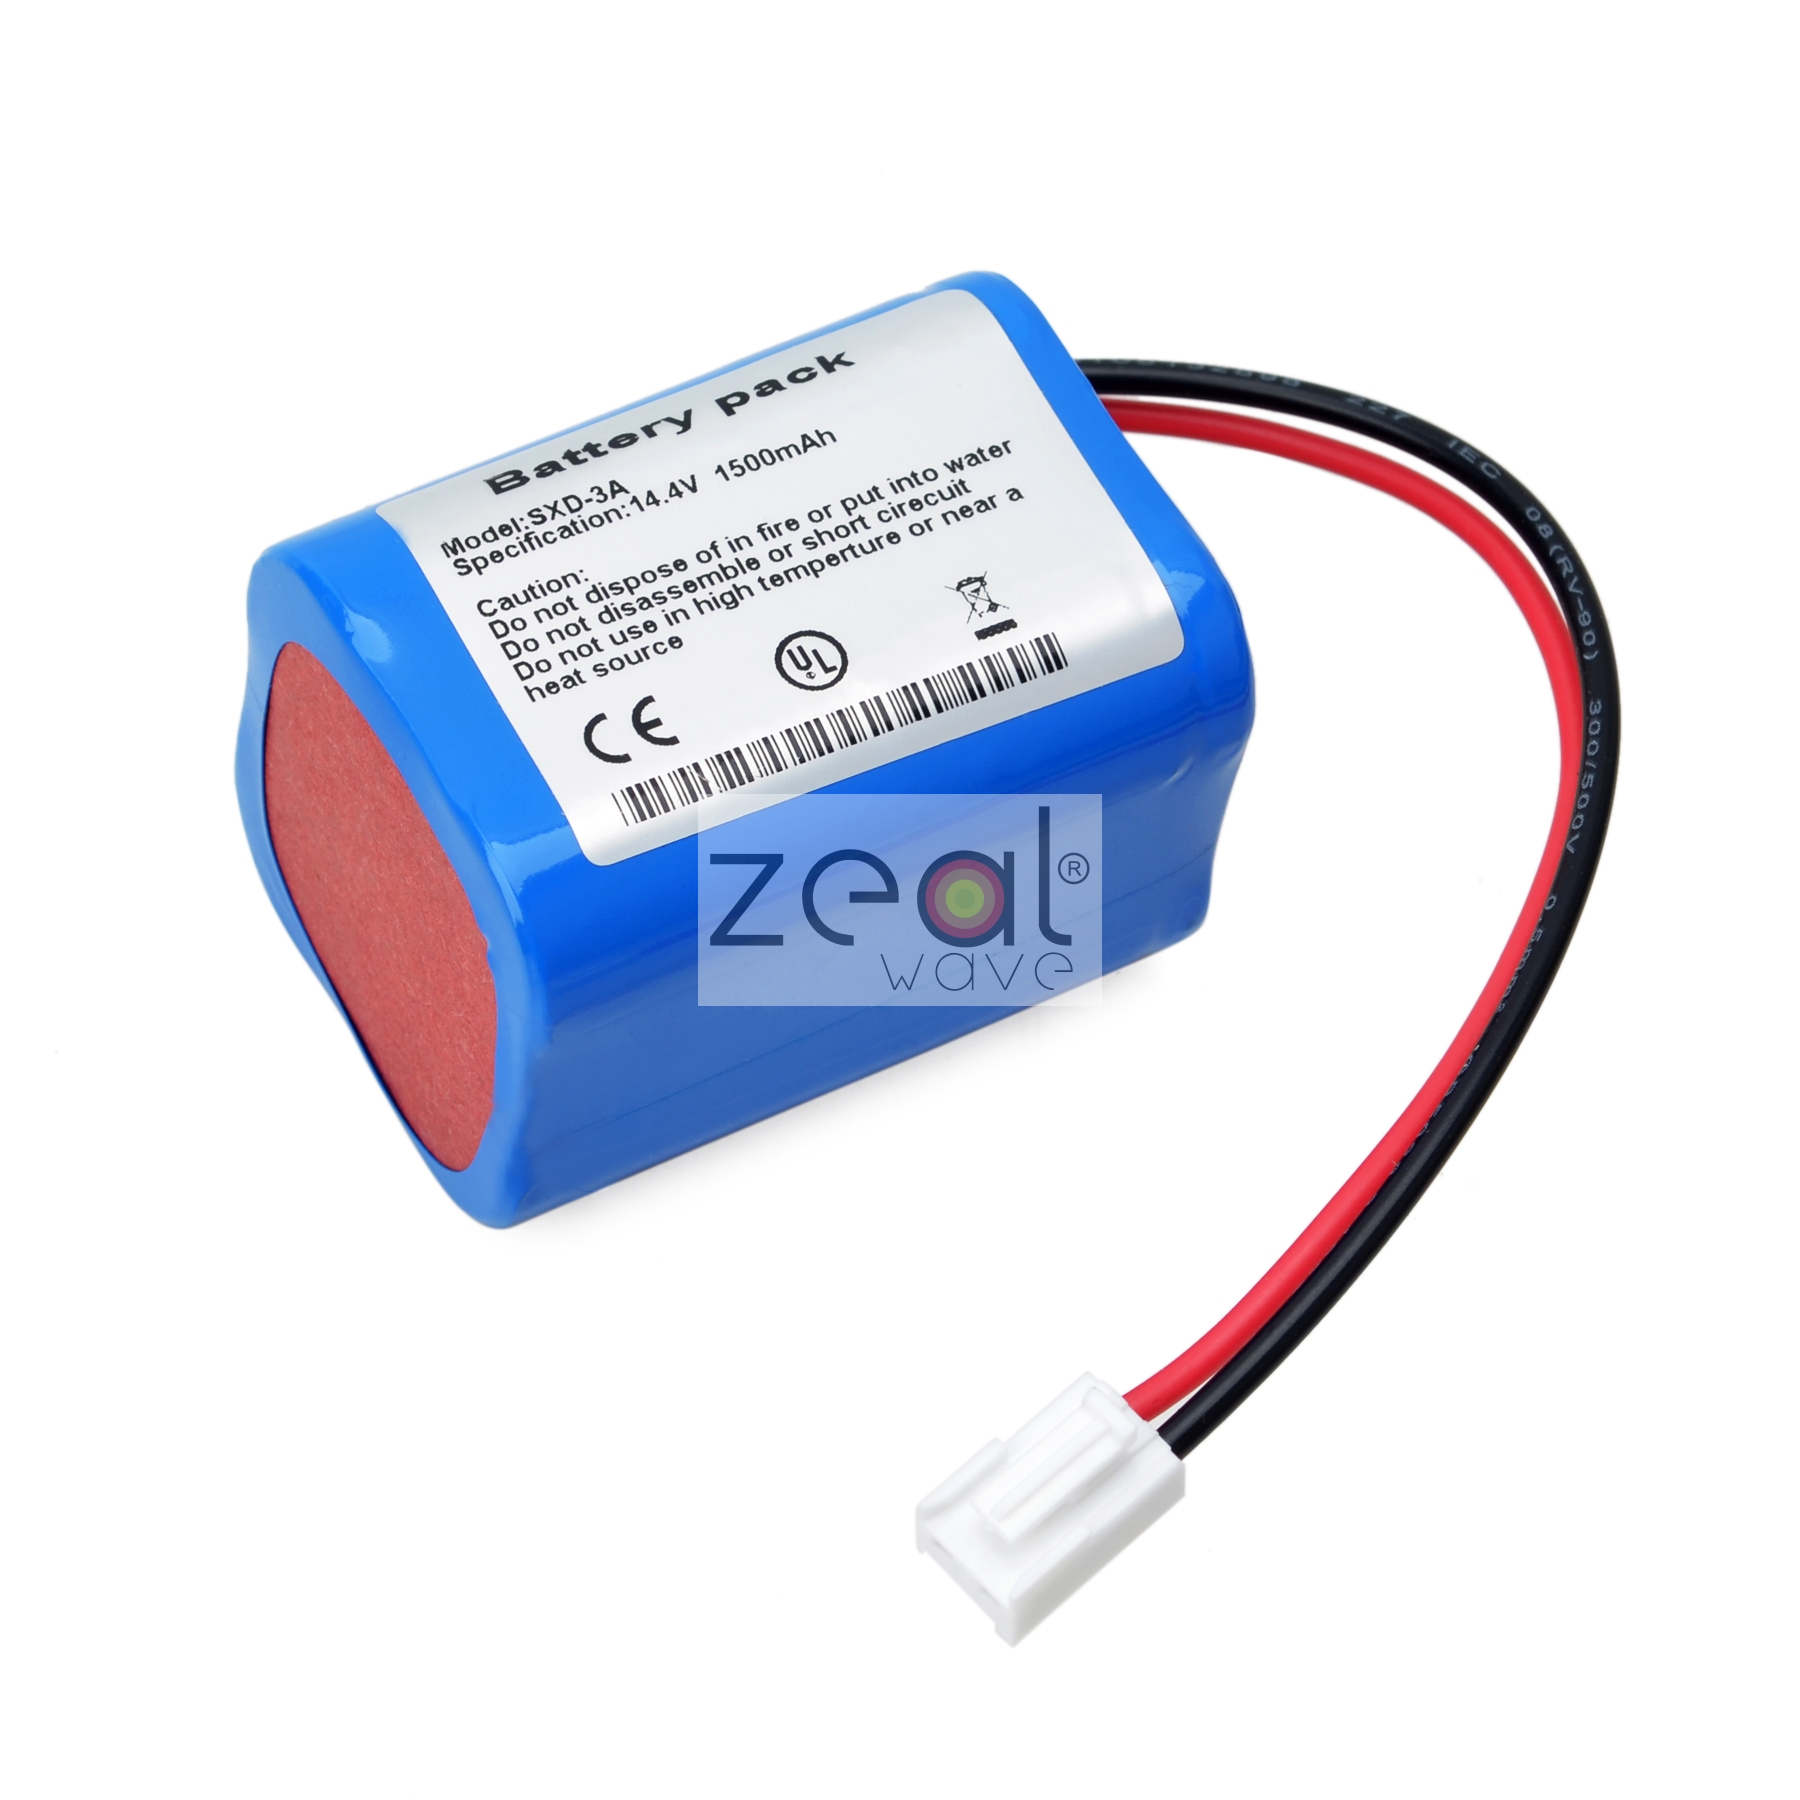 Для ZOLEE Jianyi ZOLEE Hainuo SXD 3 аккумуляторная батарея ecg 1500 mAh 14,4 V